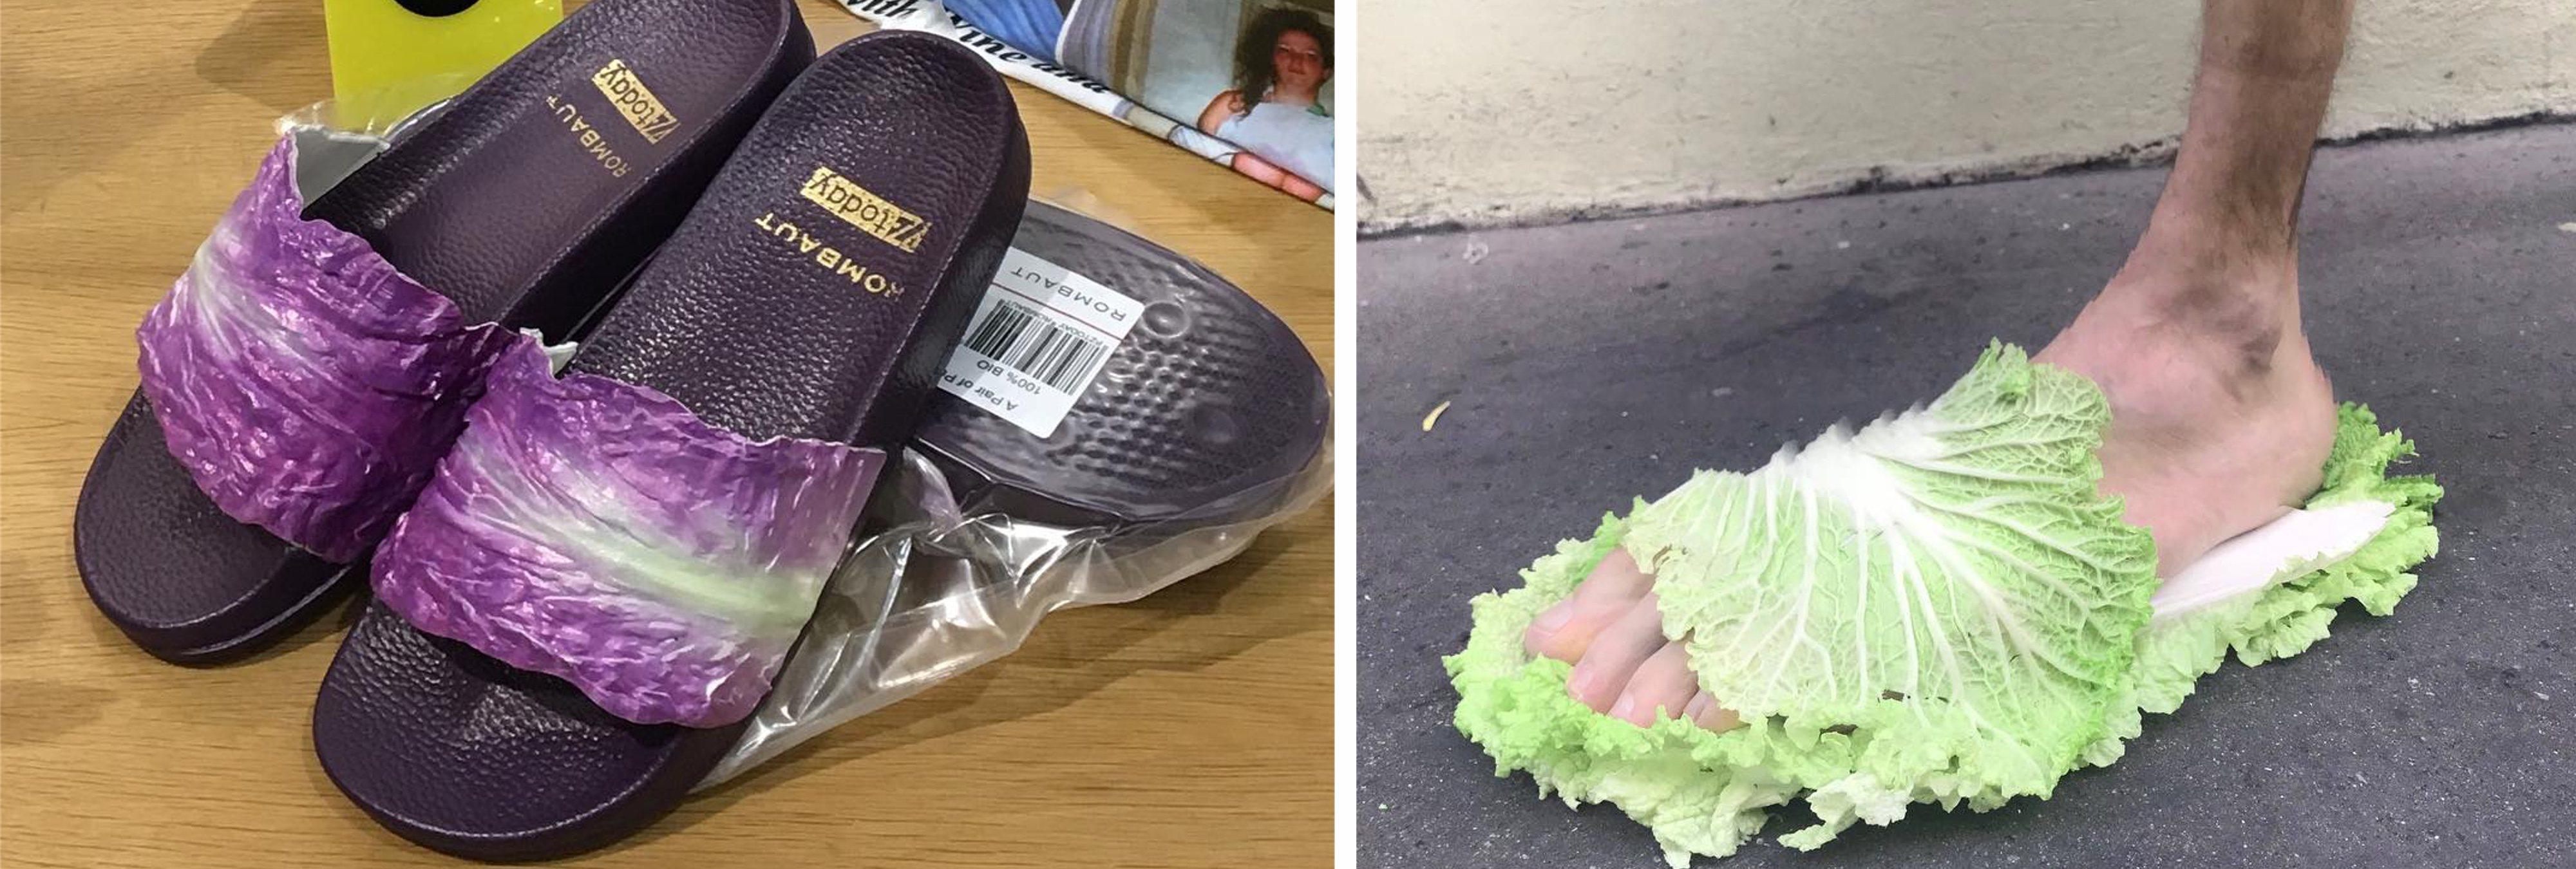 Zapatillas de lechuga a 105 euros: la nueva moda que causa furor